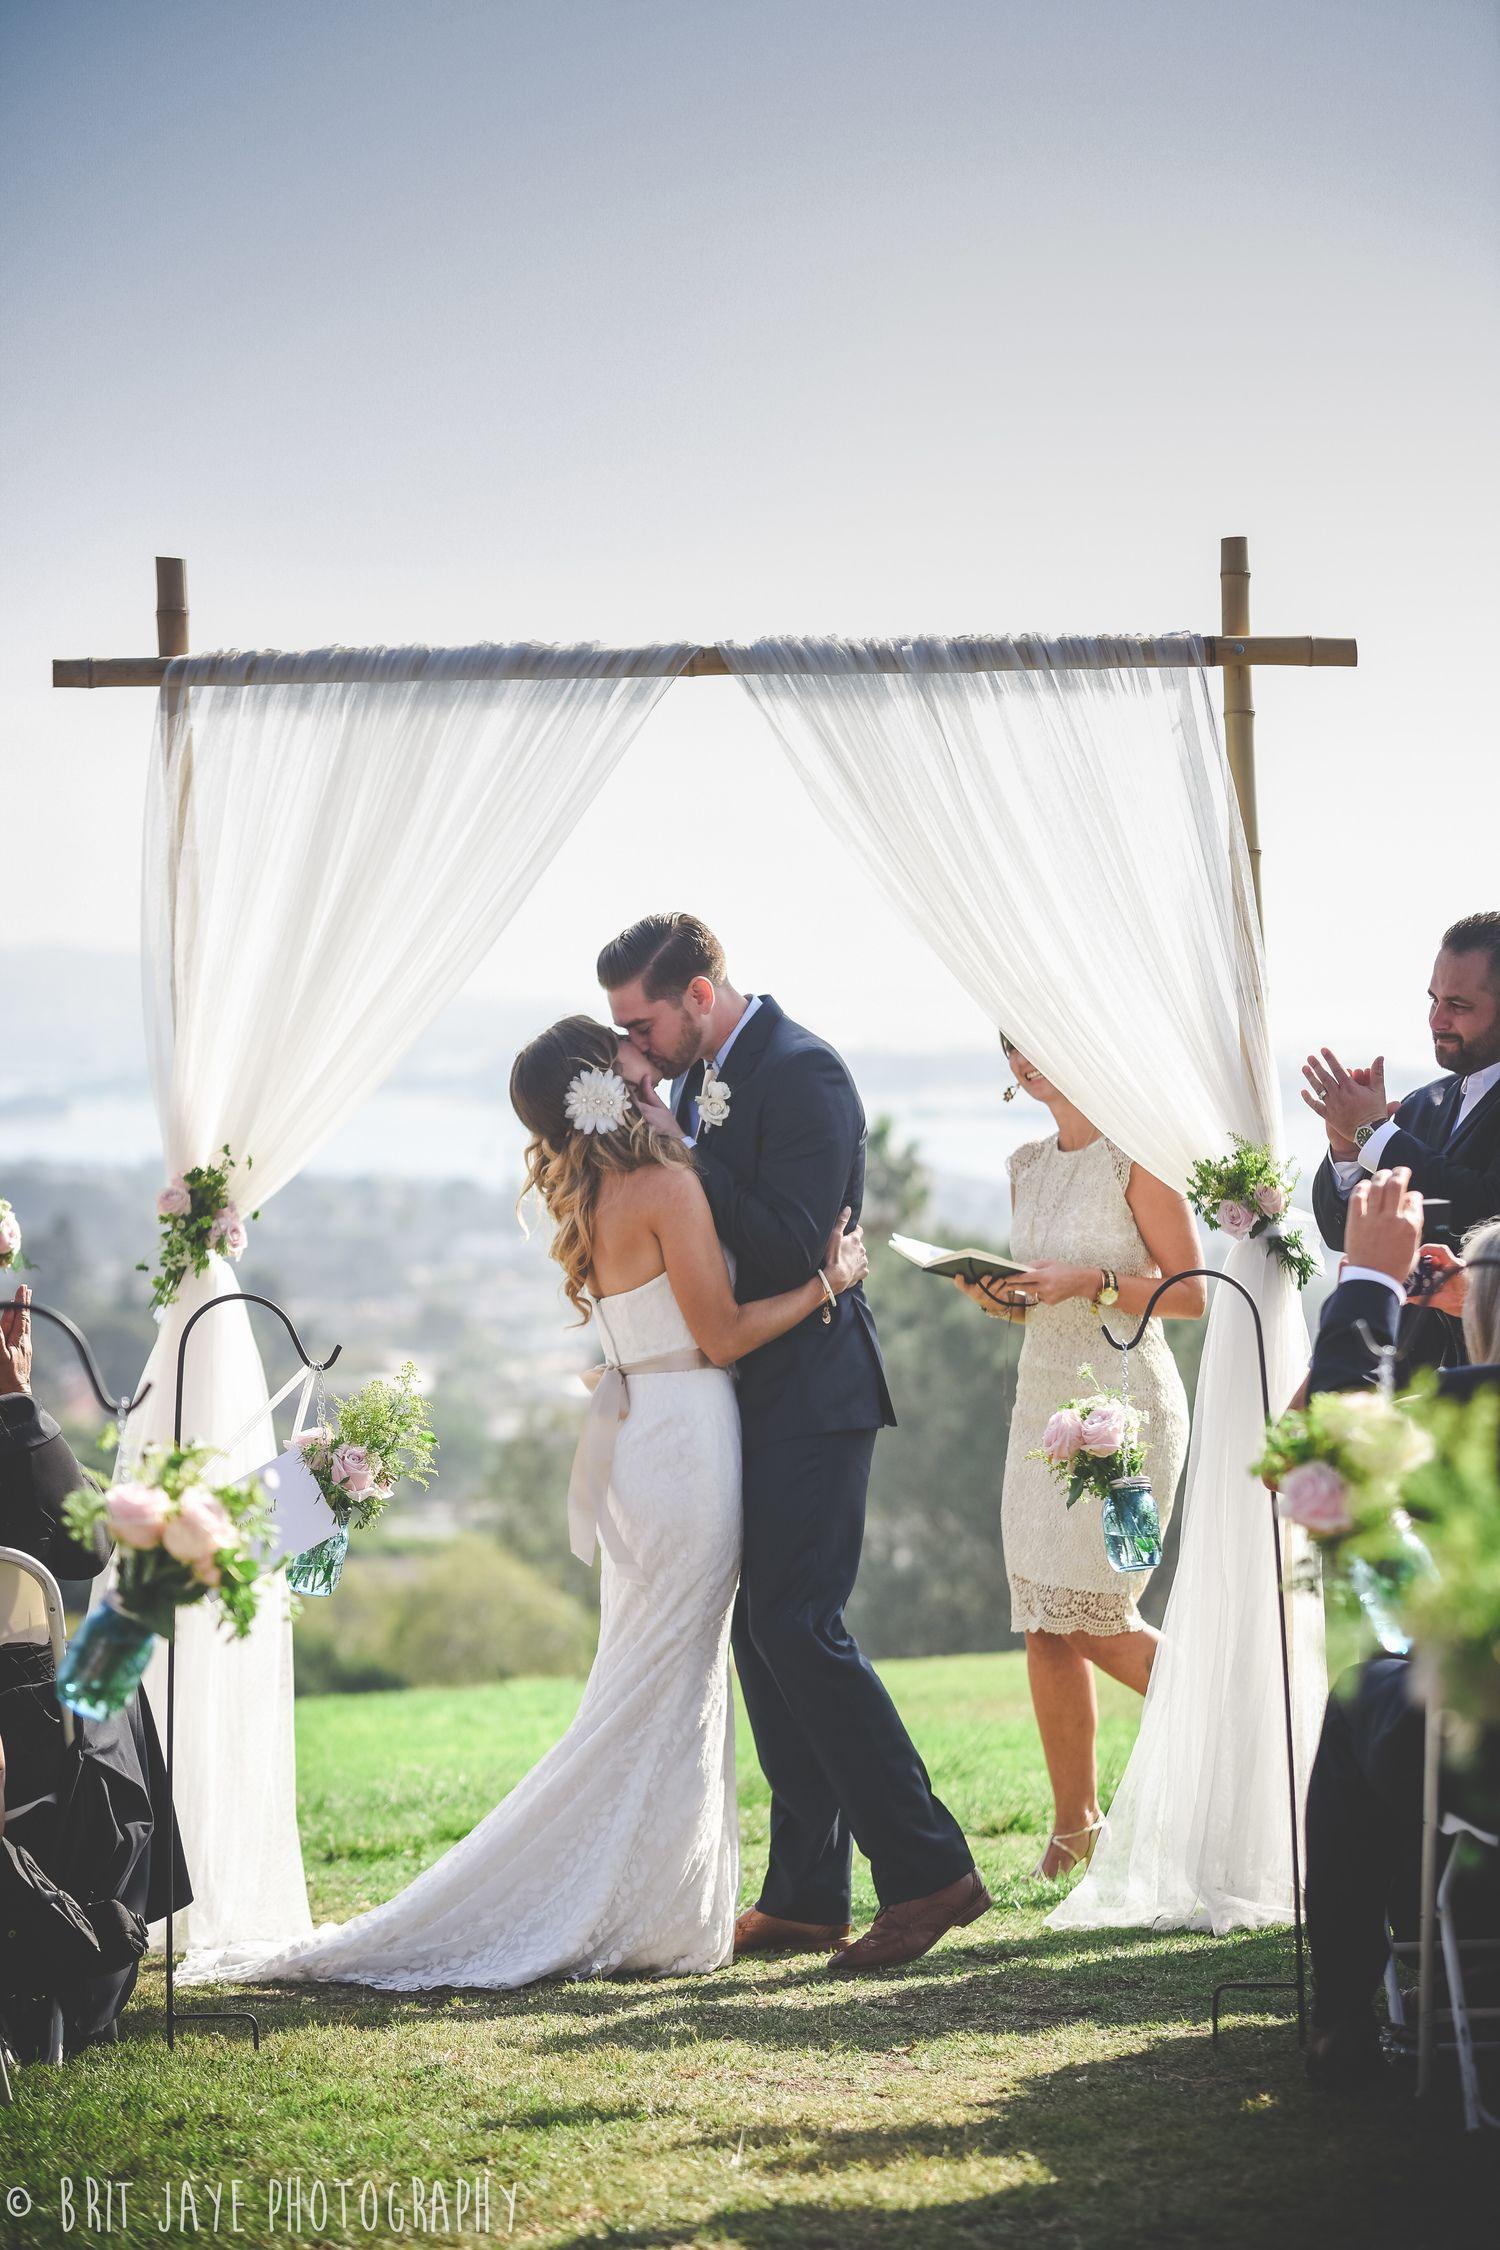 Wedding Kiss, Kate Sessions Park Wedding Ceremony, San